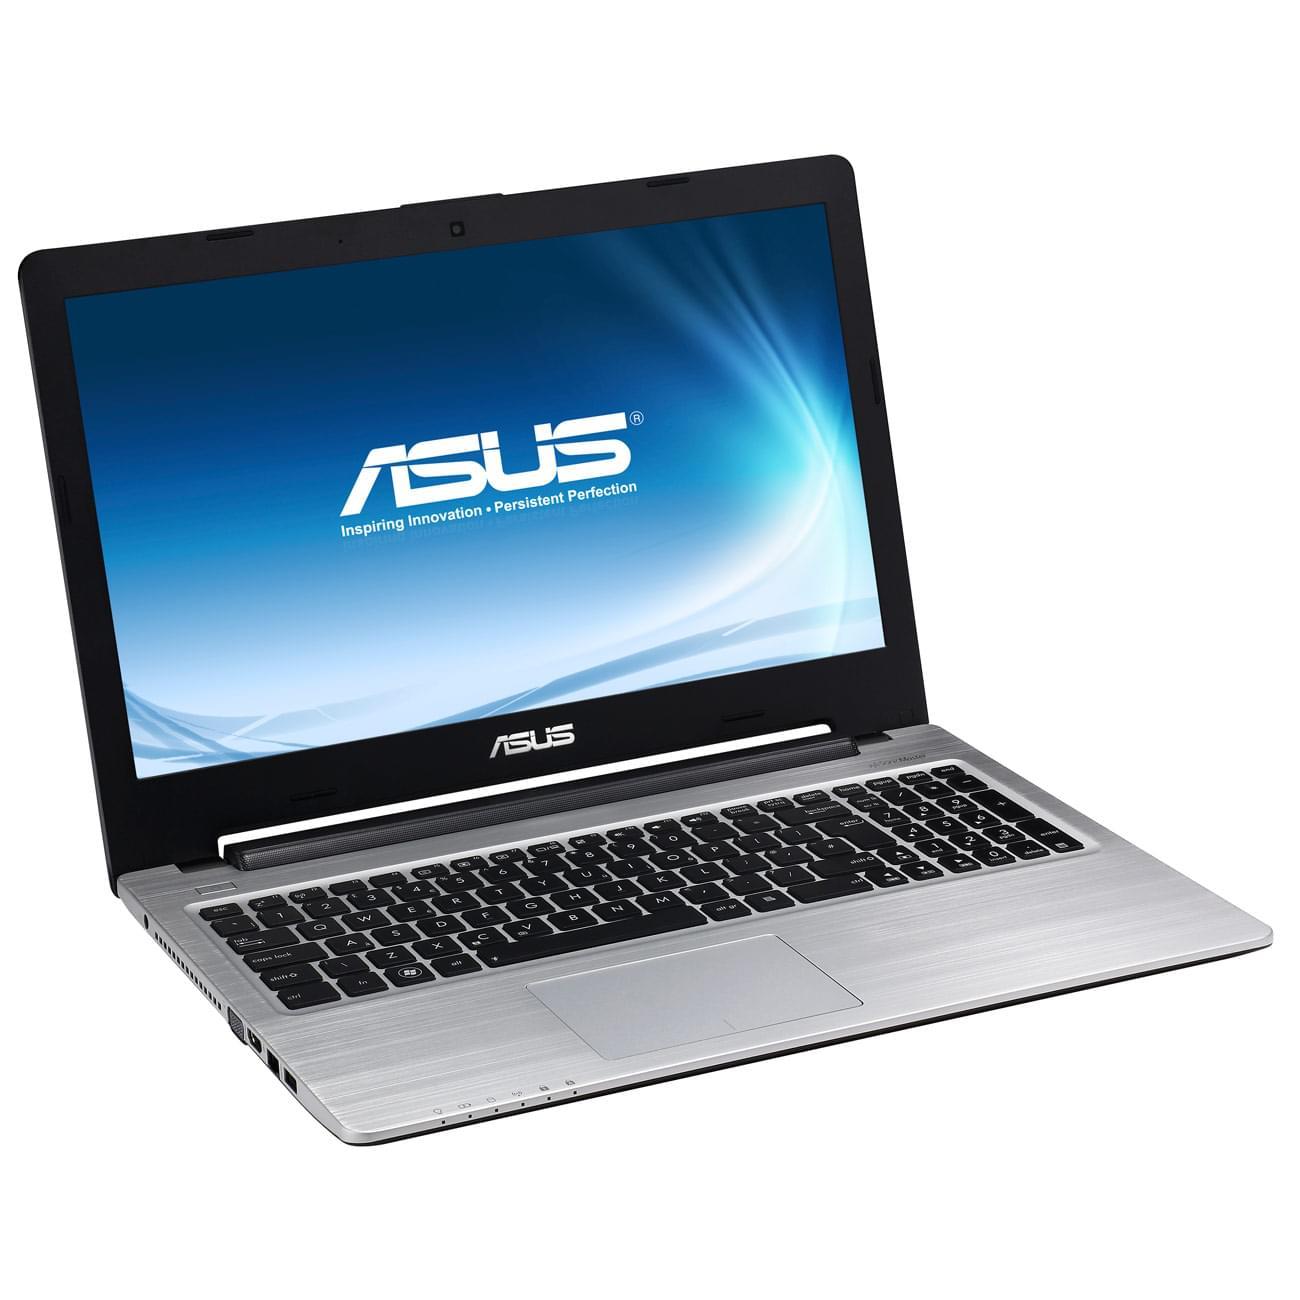 Asus K56CB-XO092H - PC portable Asus - Cybertek.fr - 0